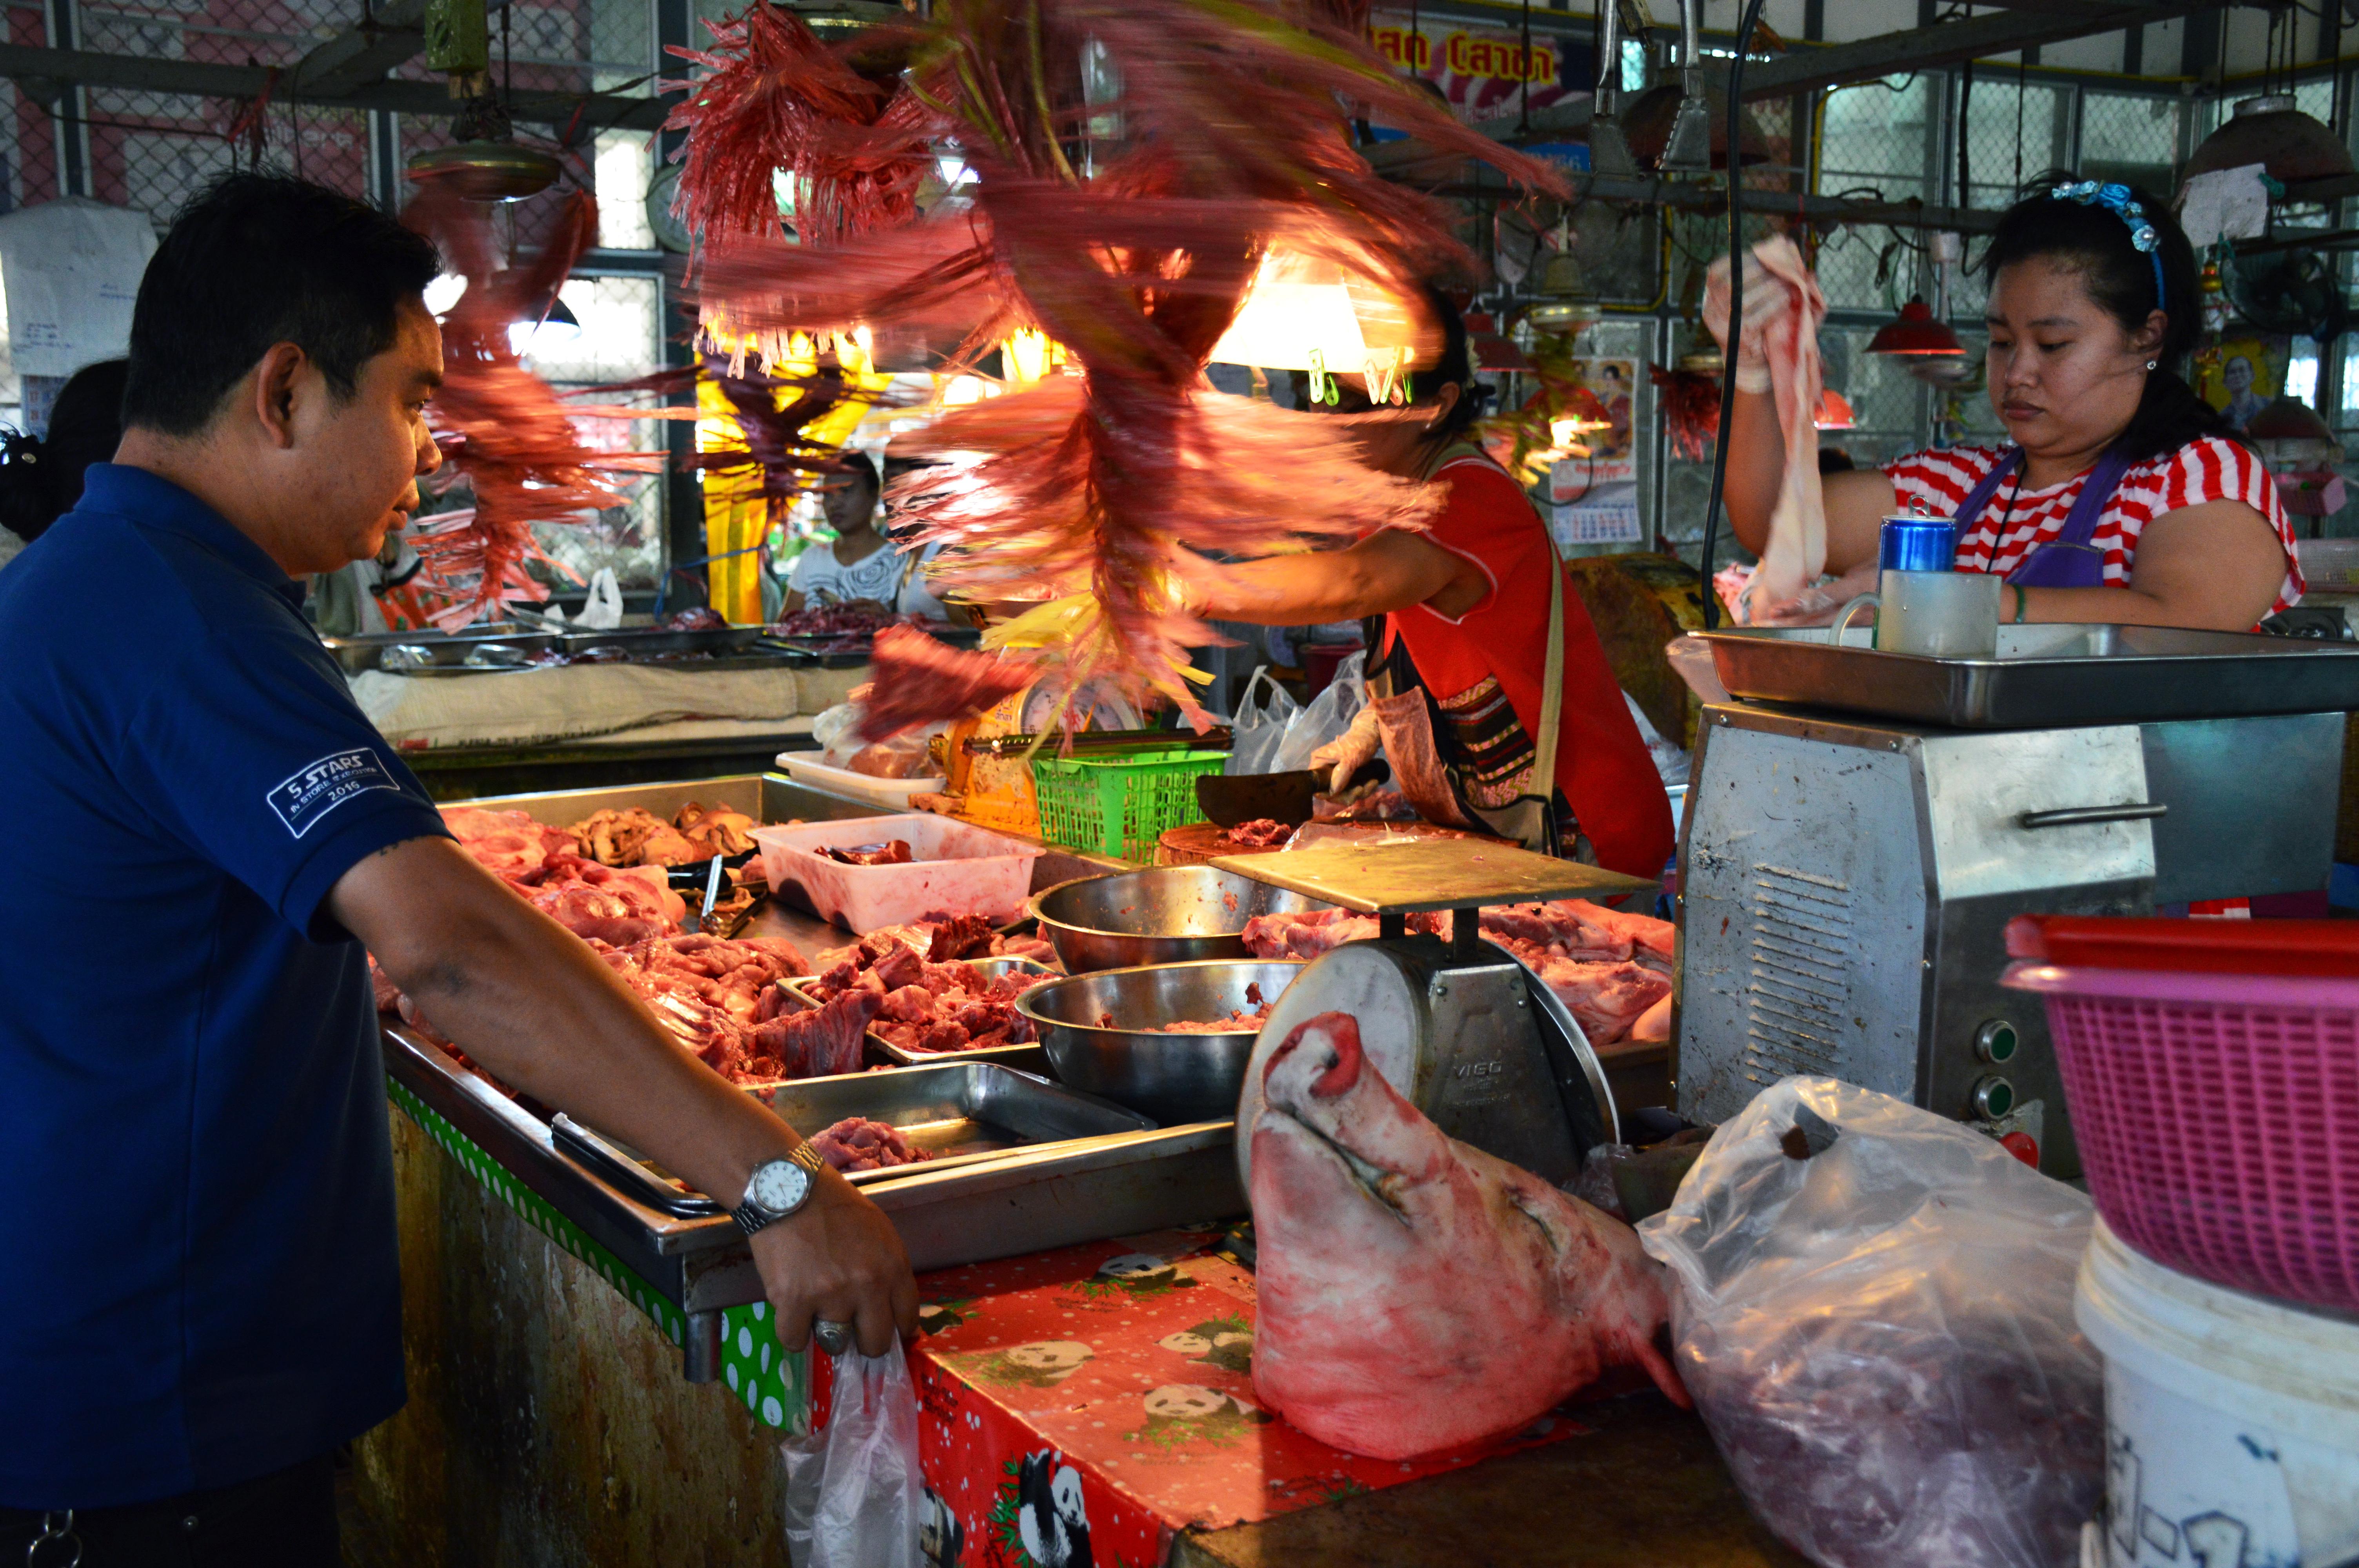 Butcher market Asia Scenic cooking school Double-Barrelled Travel